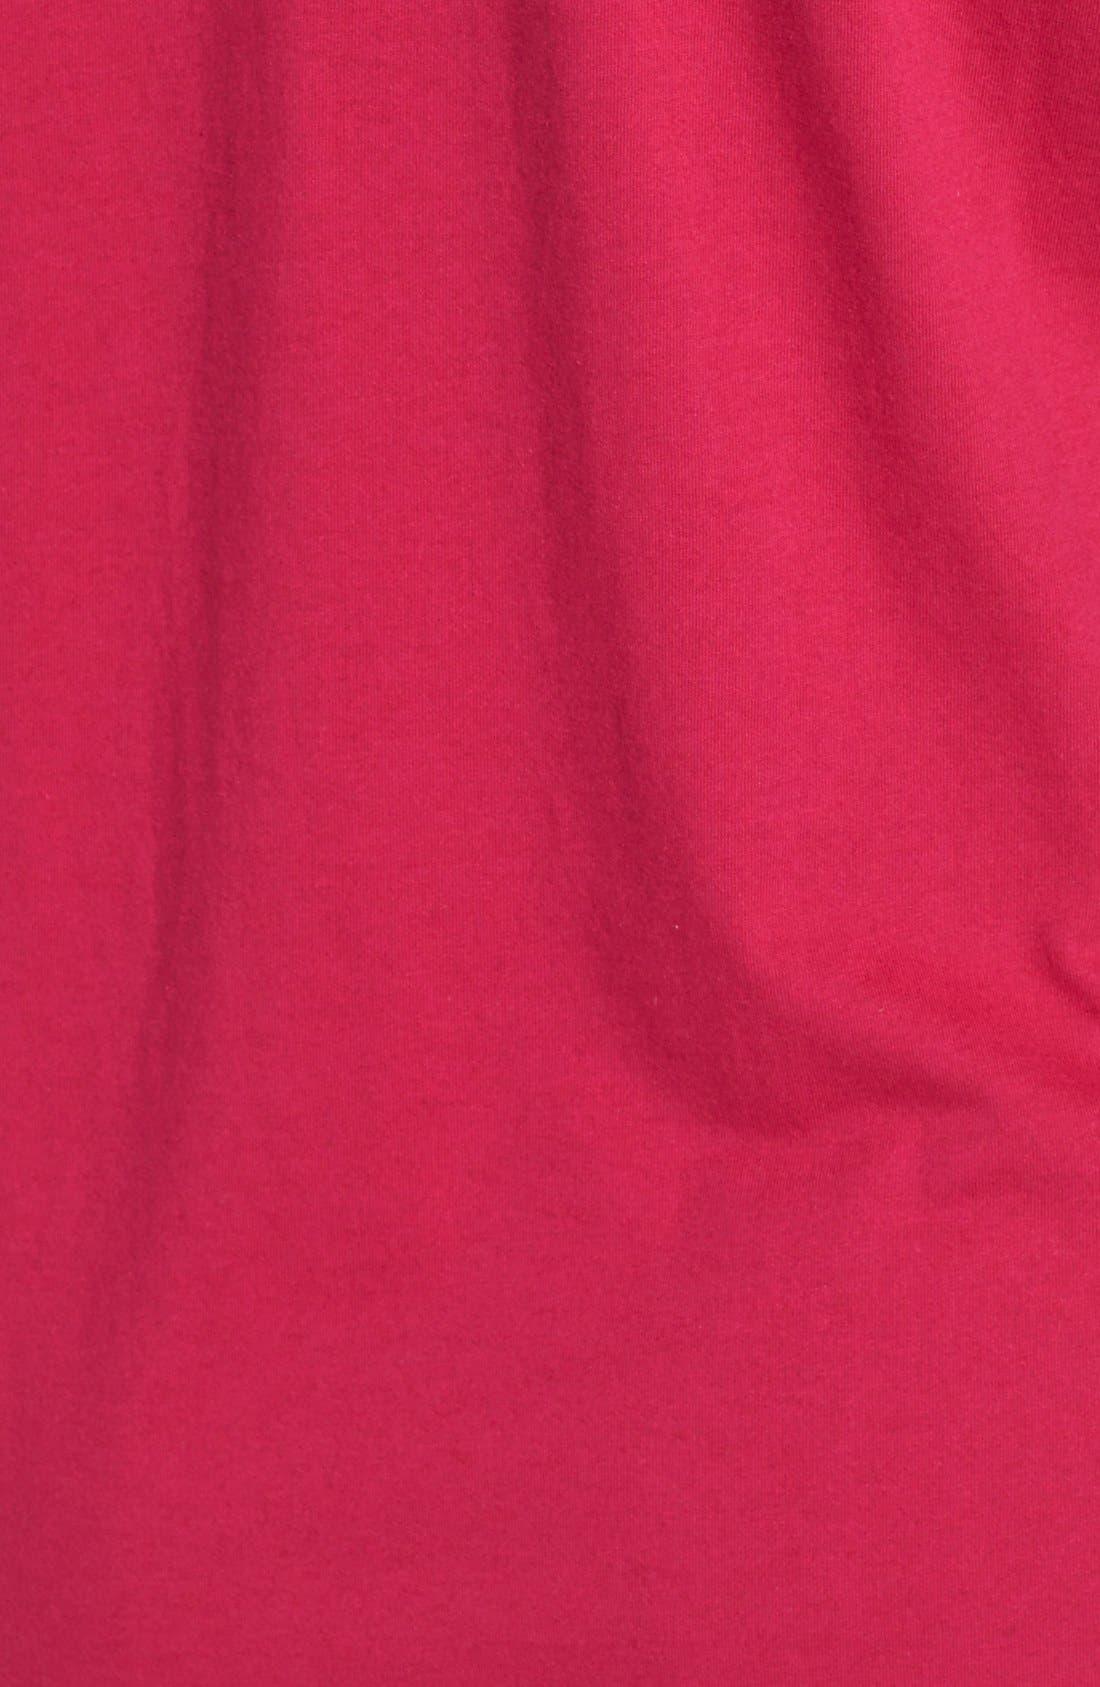 Alternate Image 3  - MICHAEL Michael Kors Short Sleeve V-Neck Top (Plus Size)